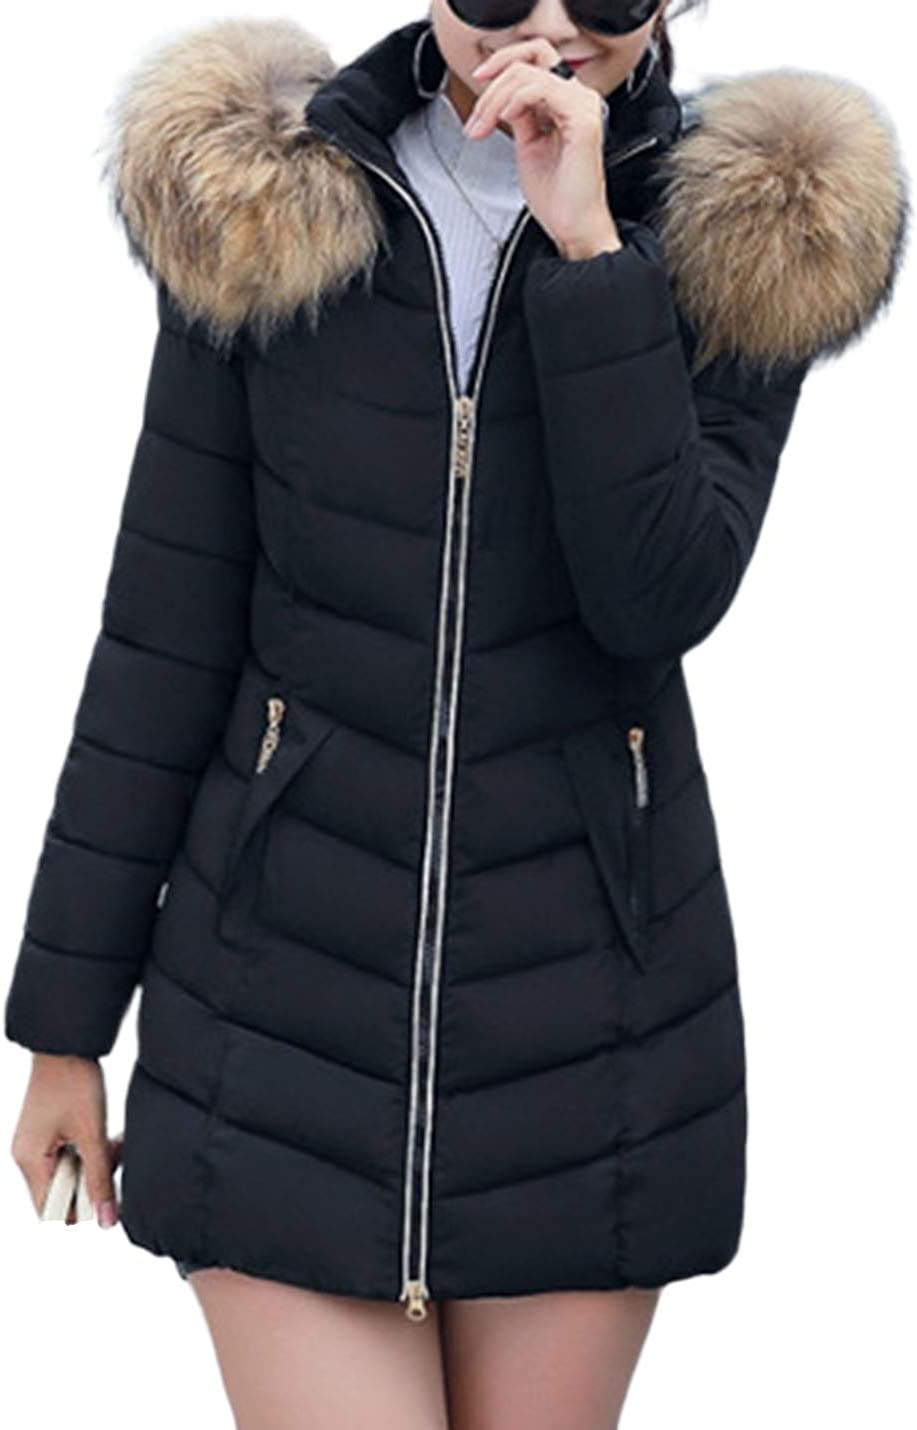 Yeokou Womens Casual Slim Faux Fur Neck Mid Long Zipper Cotton Padded Hoodie Coats